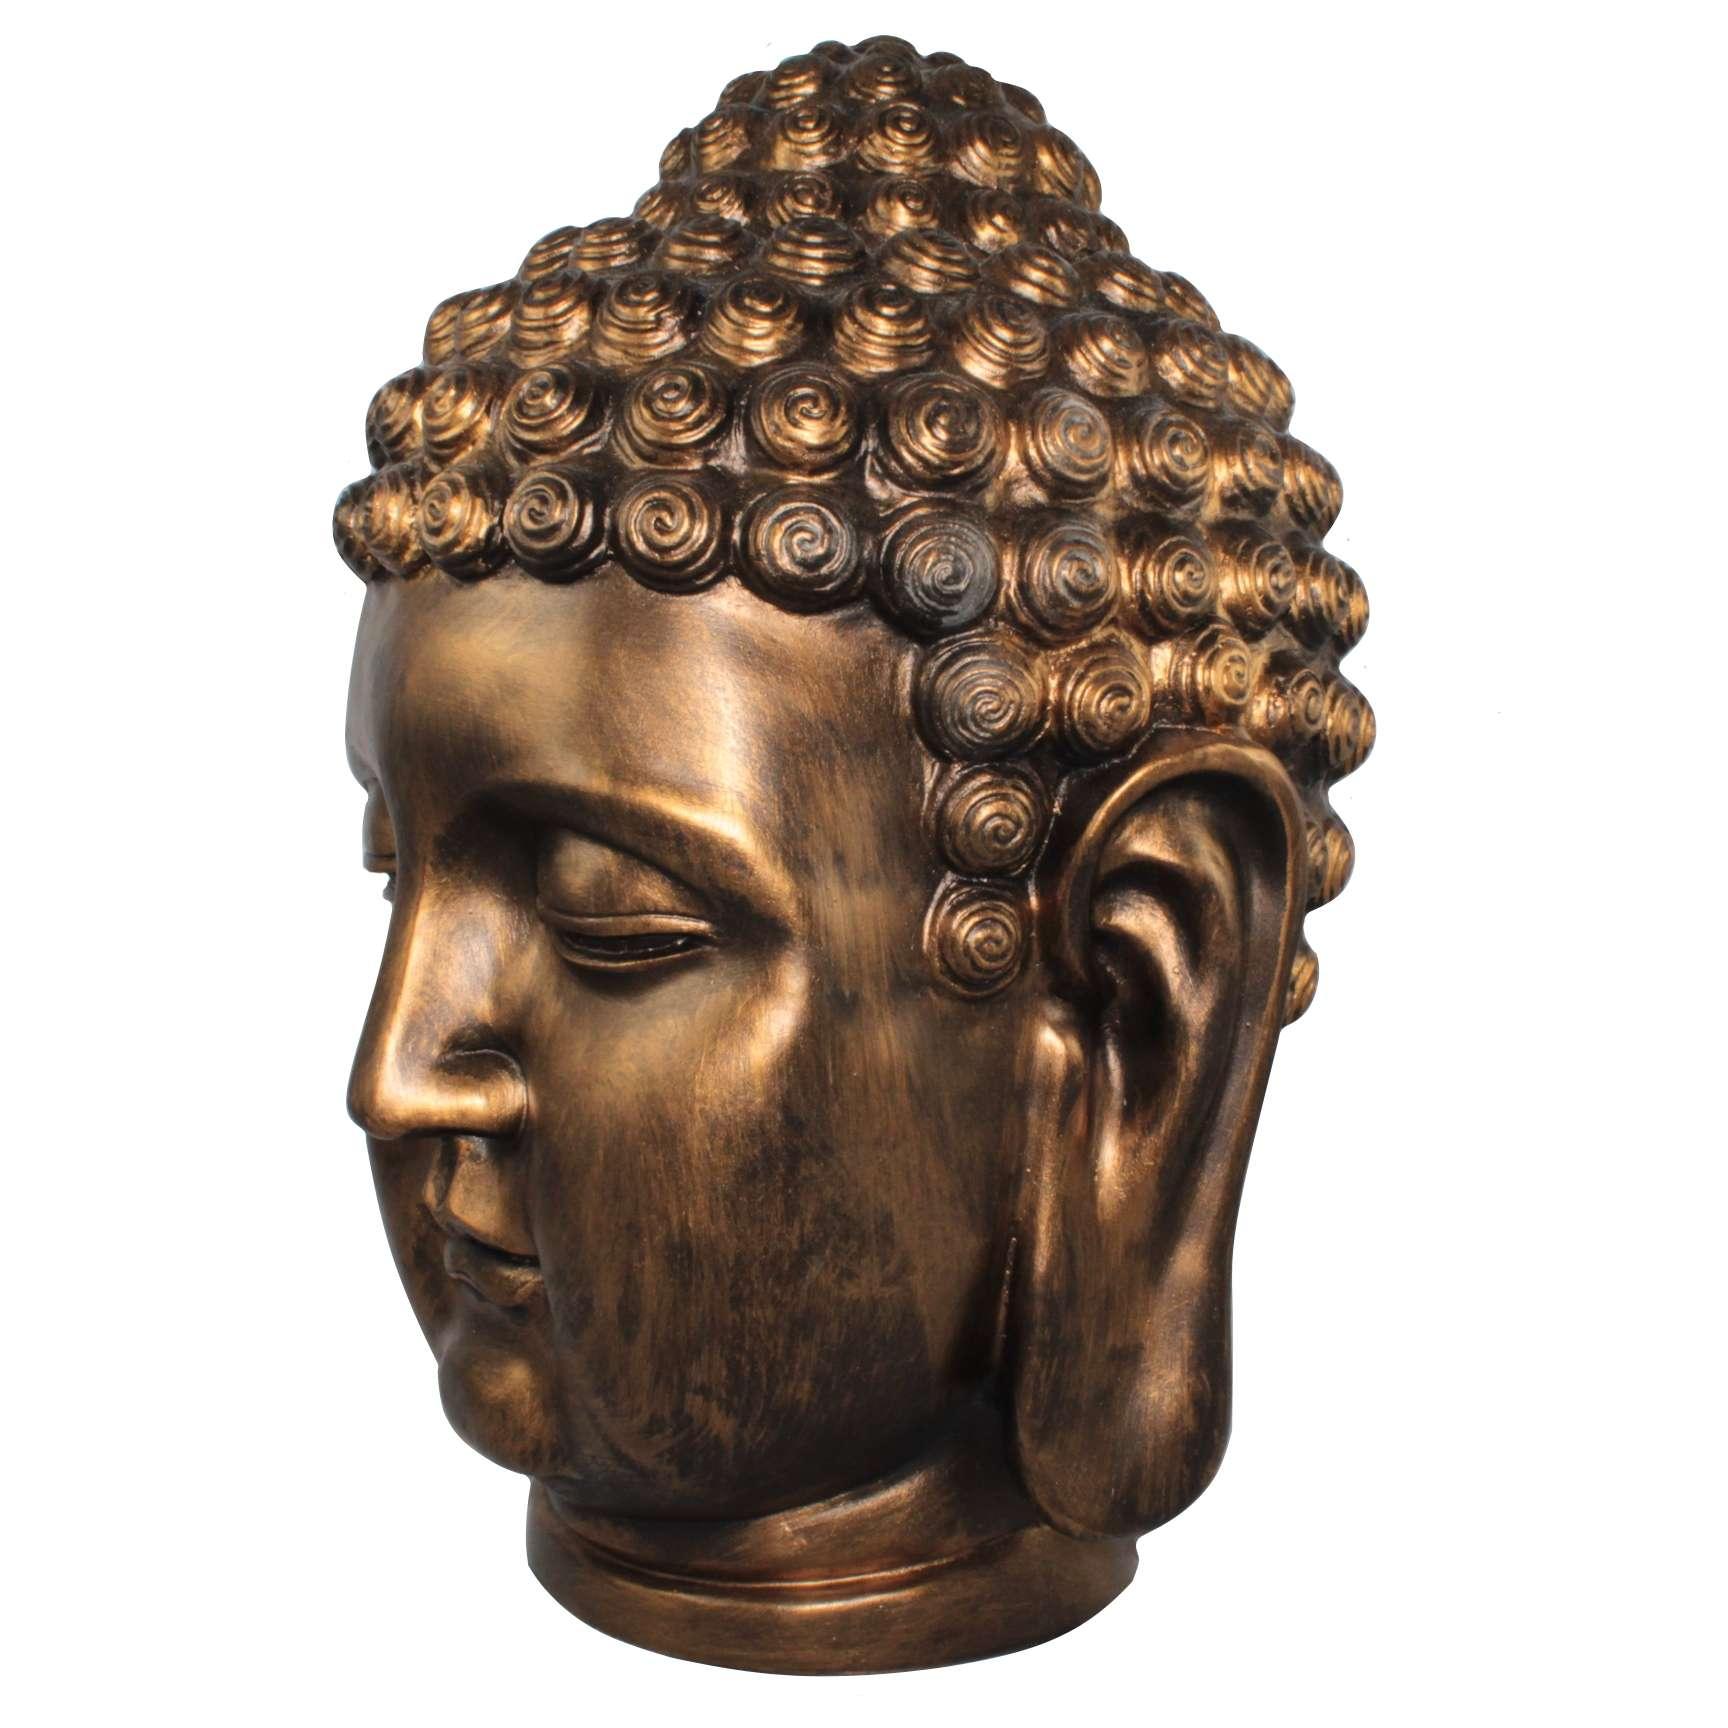 xxl deko buddhakopf bronze buddha design figur kopf. Black Bedroom Furniture Sets. Home Design Ideas